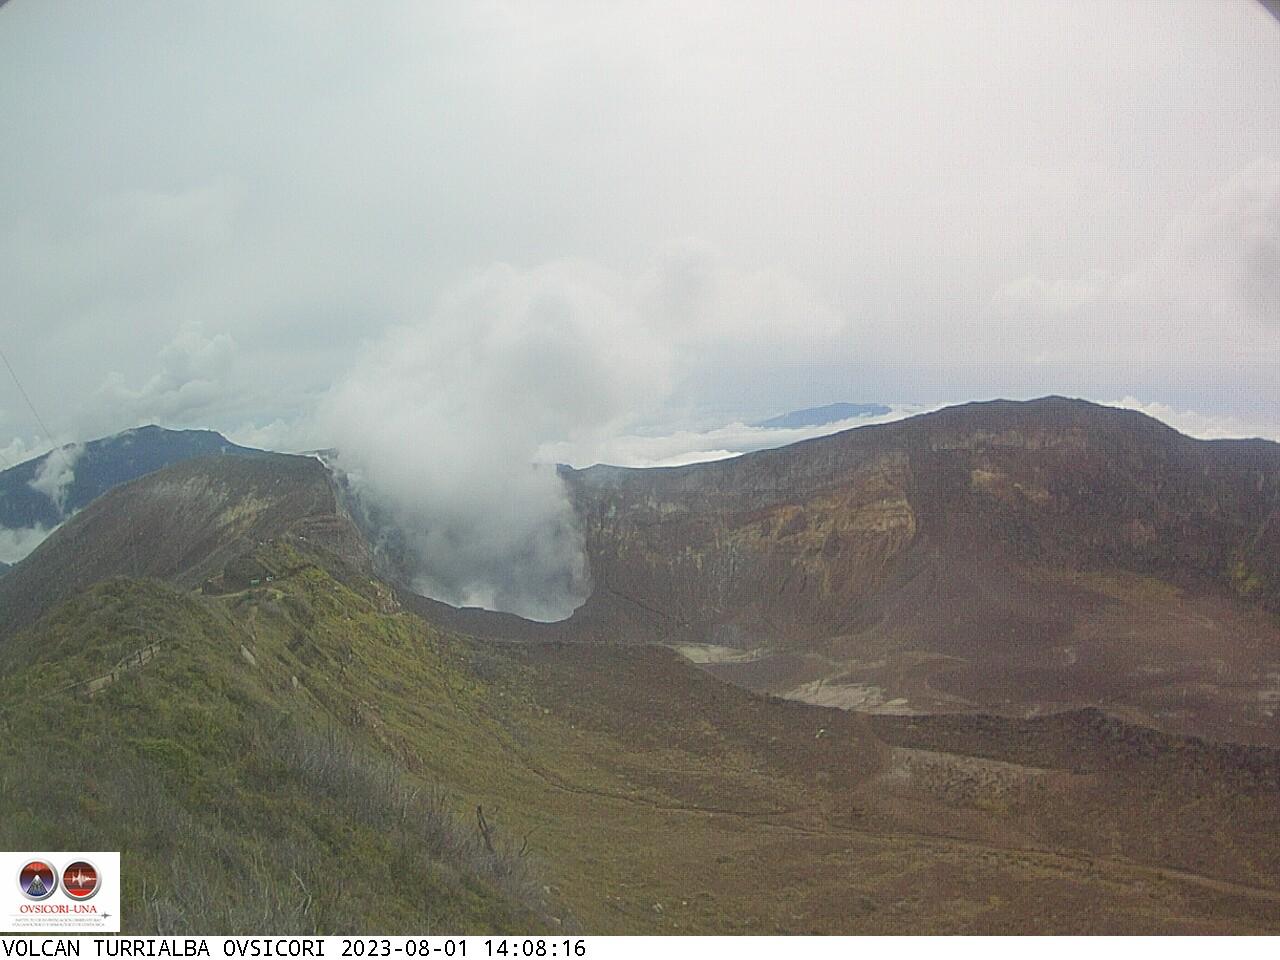 Volcano Turrialba Sun. 14:08